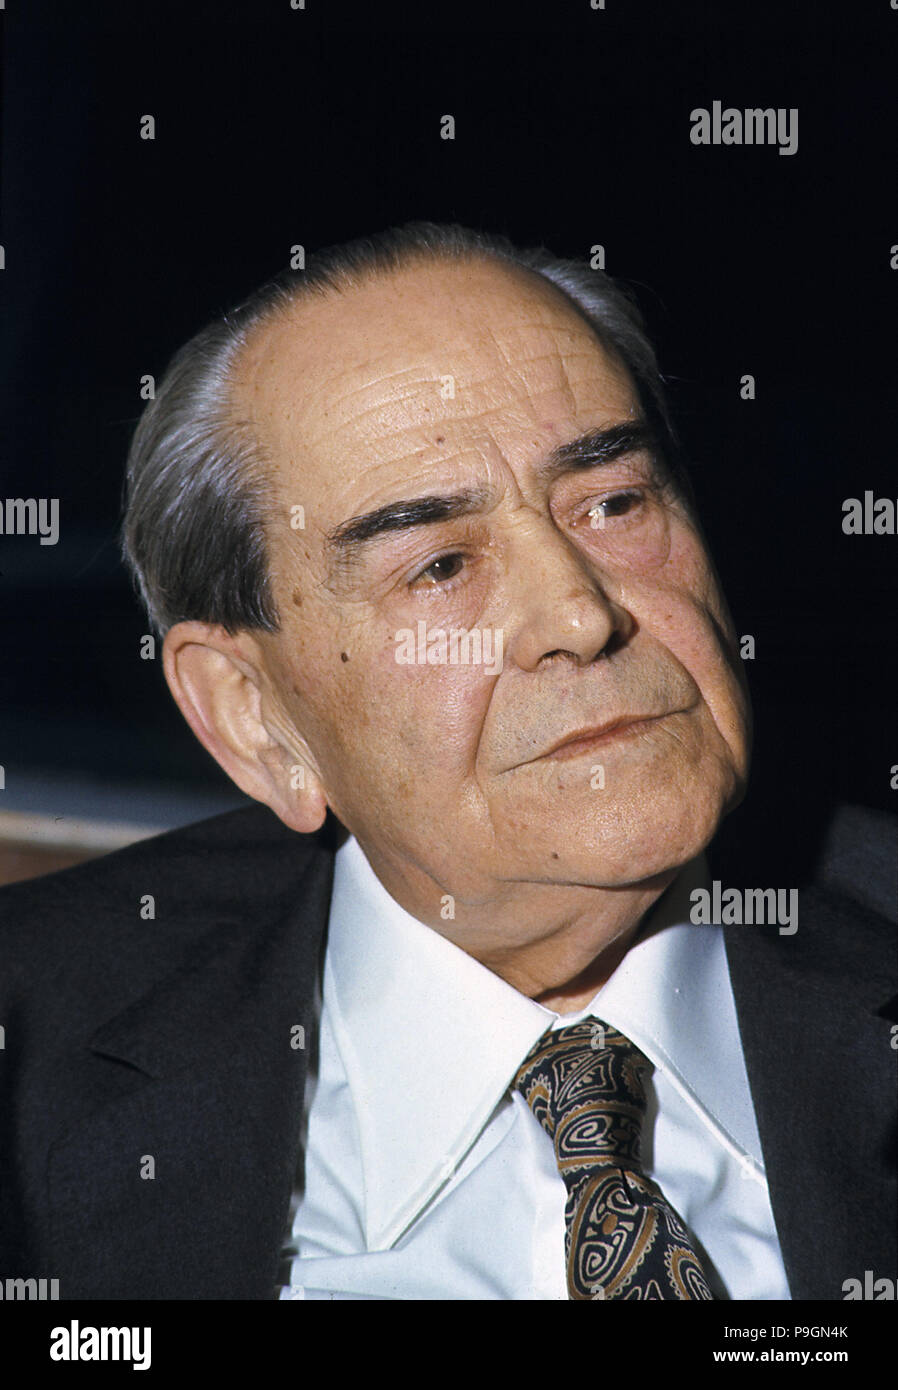 Rodolfo Llopis (1895-1983), Spanish politician, photo 1980. - Stock Image